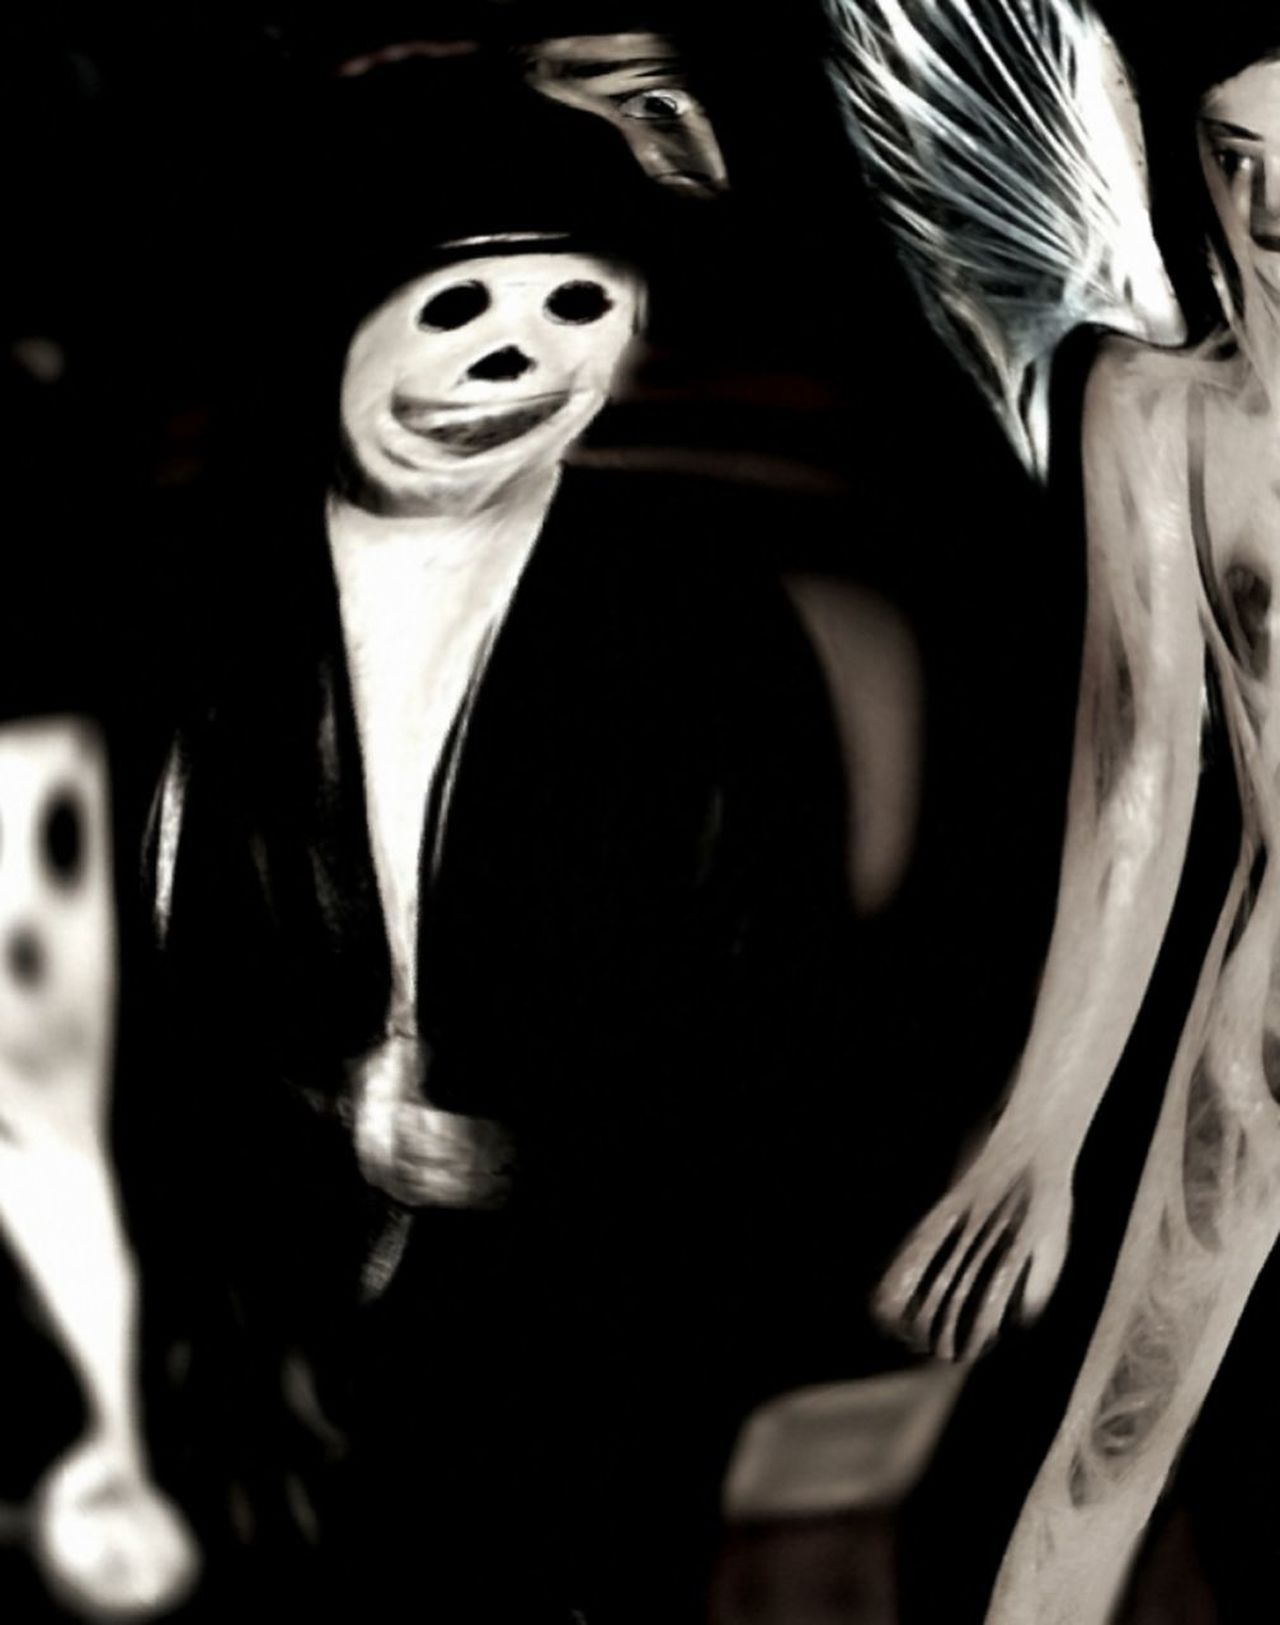 Darkart Black&white Fortheloveofblackandwhite Monochrome